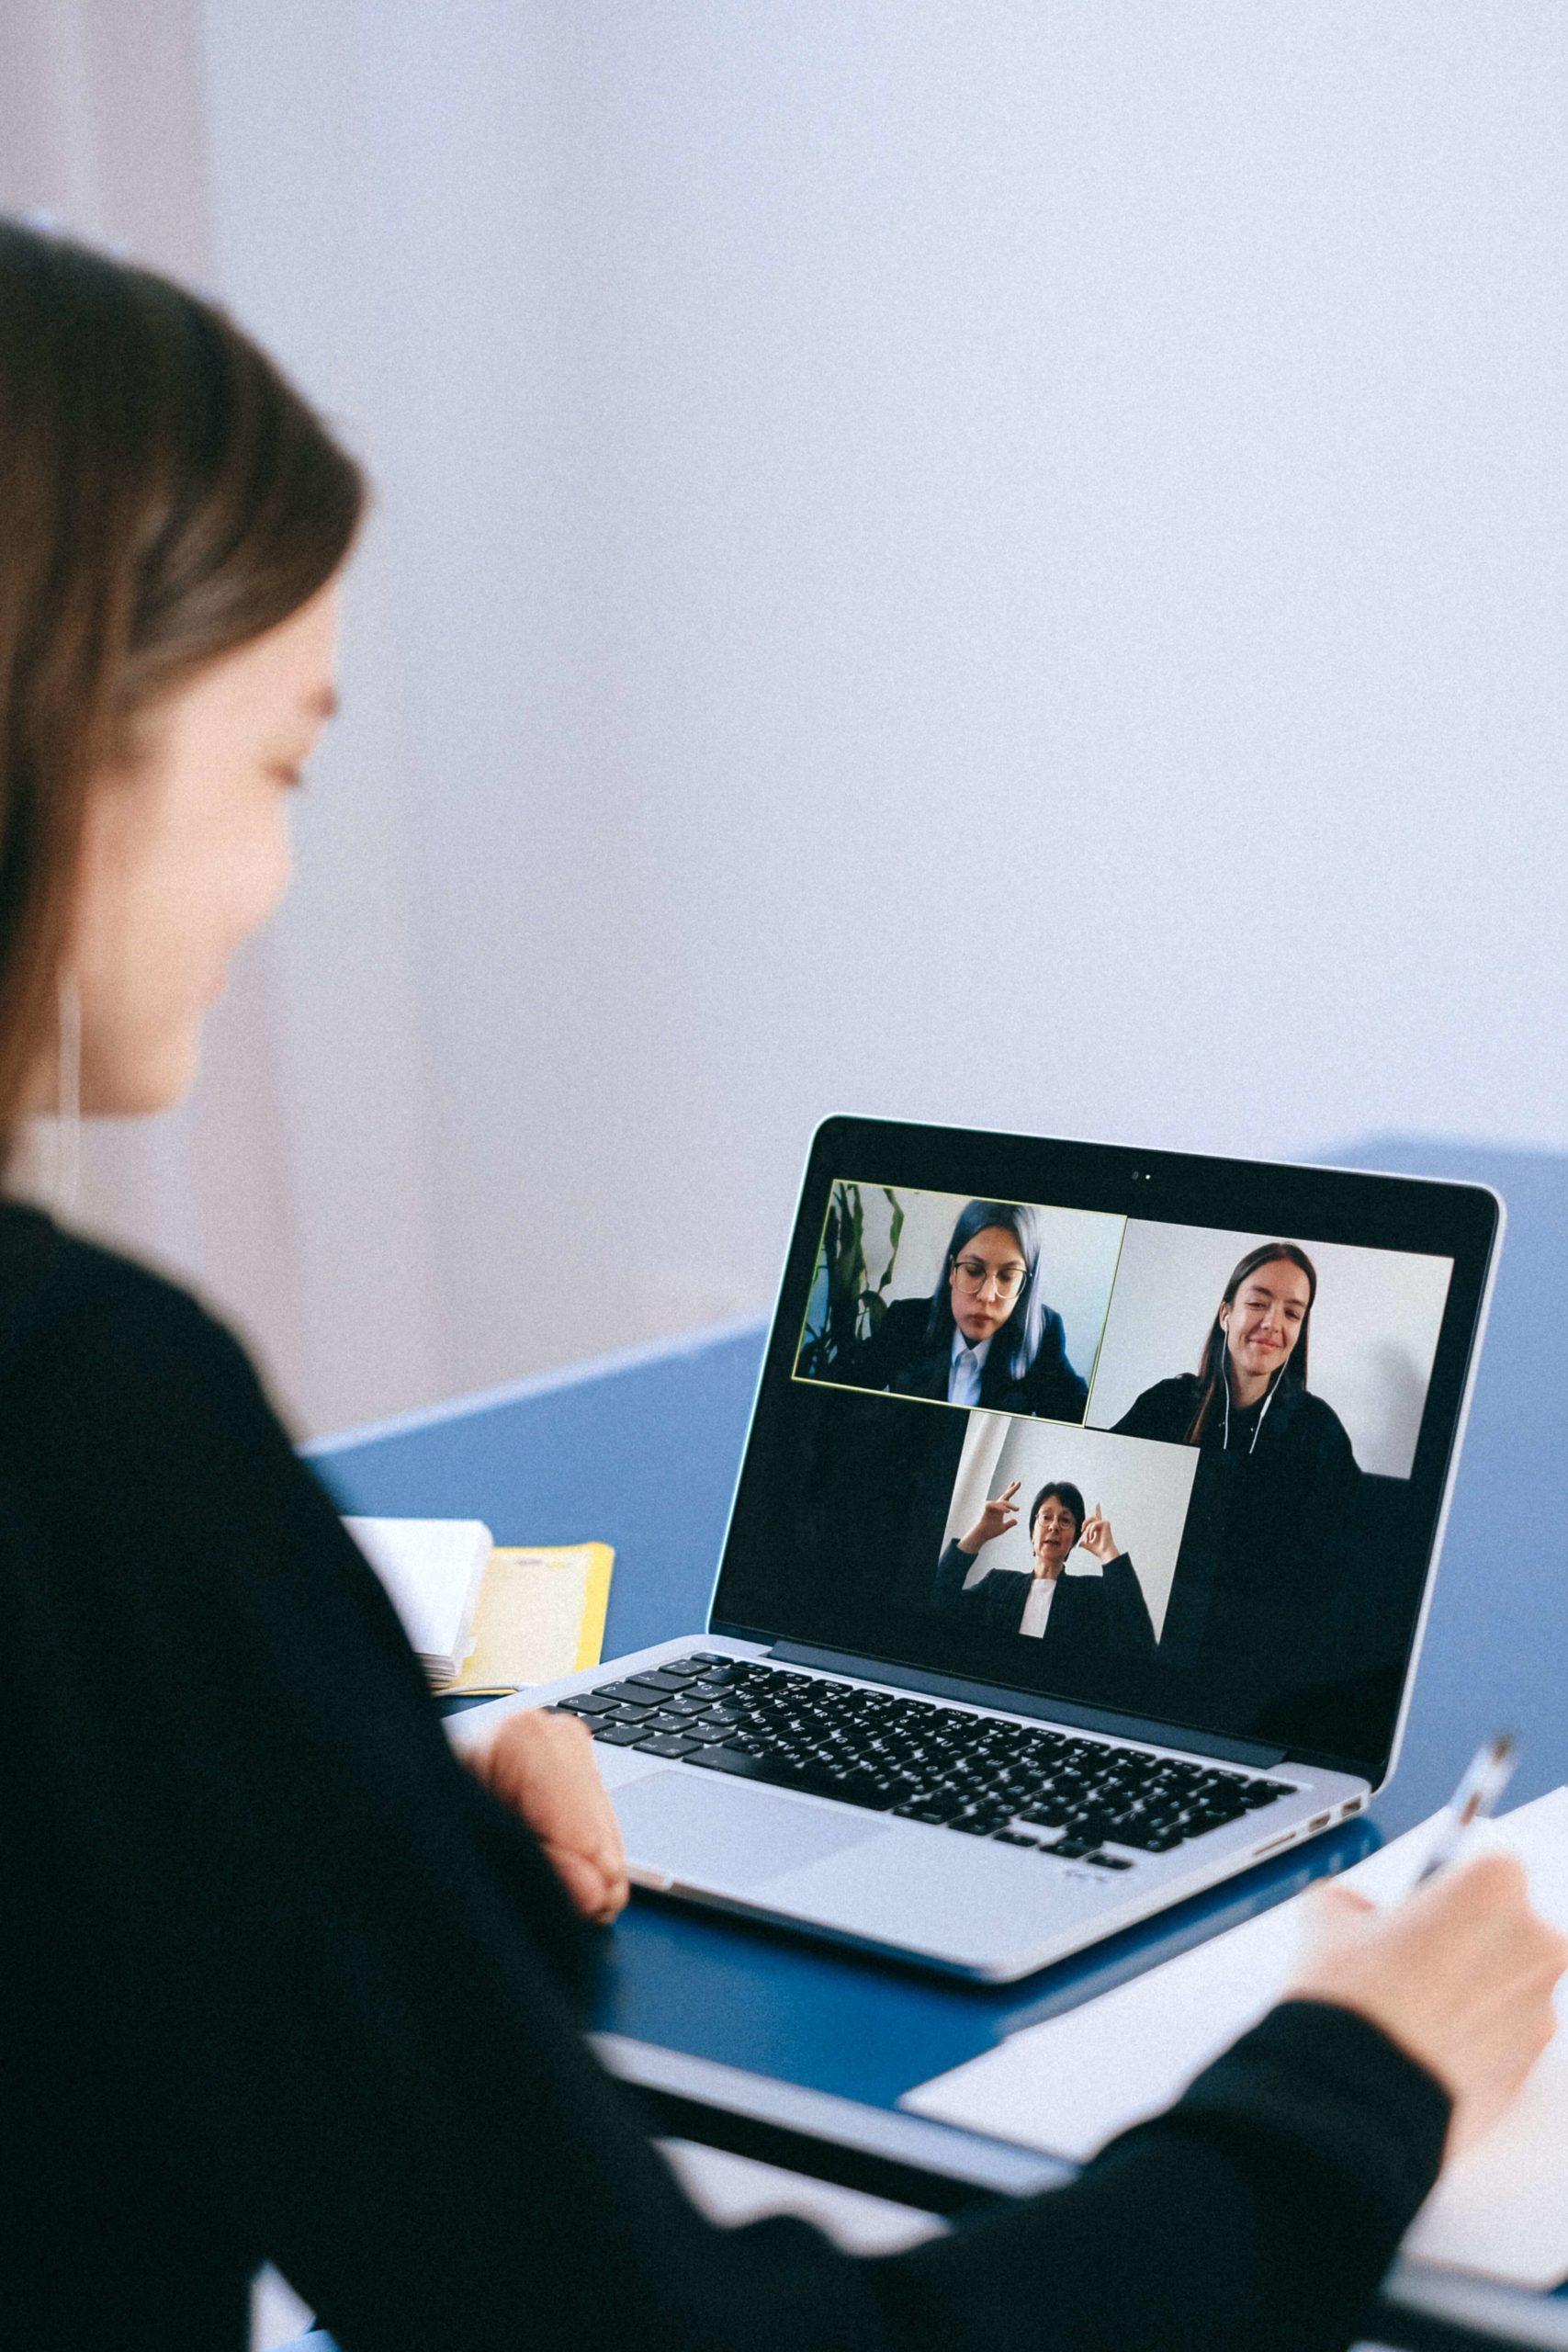 zajęcia semestralne online